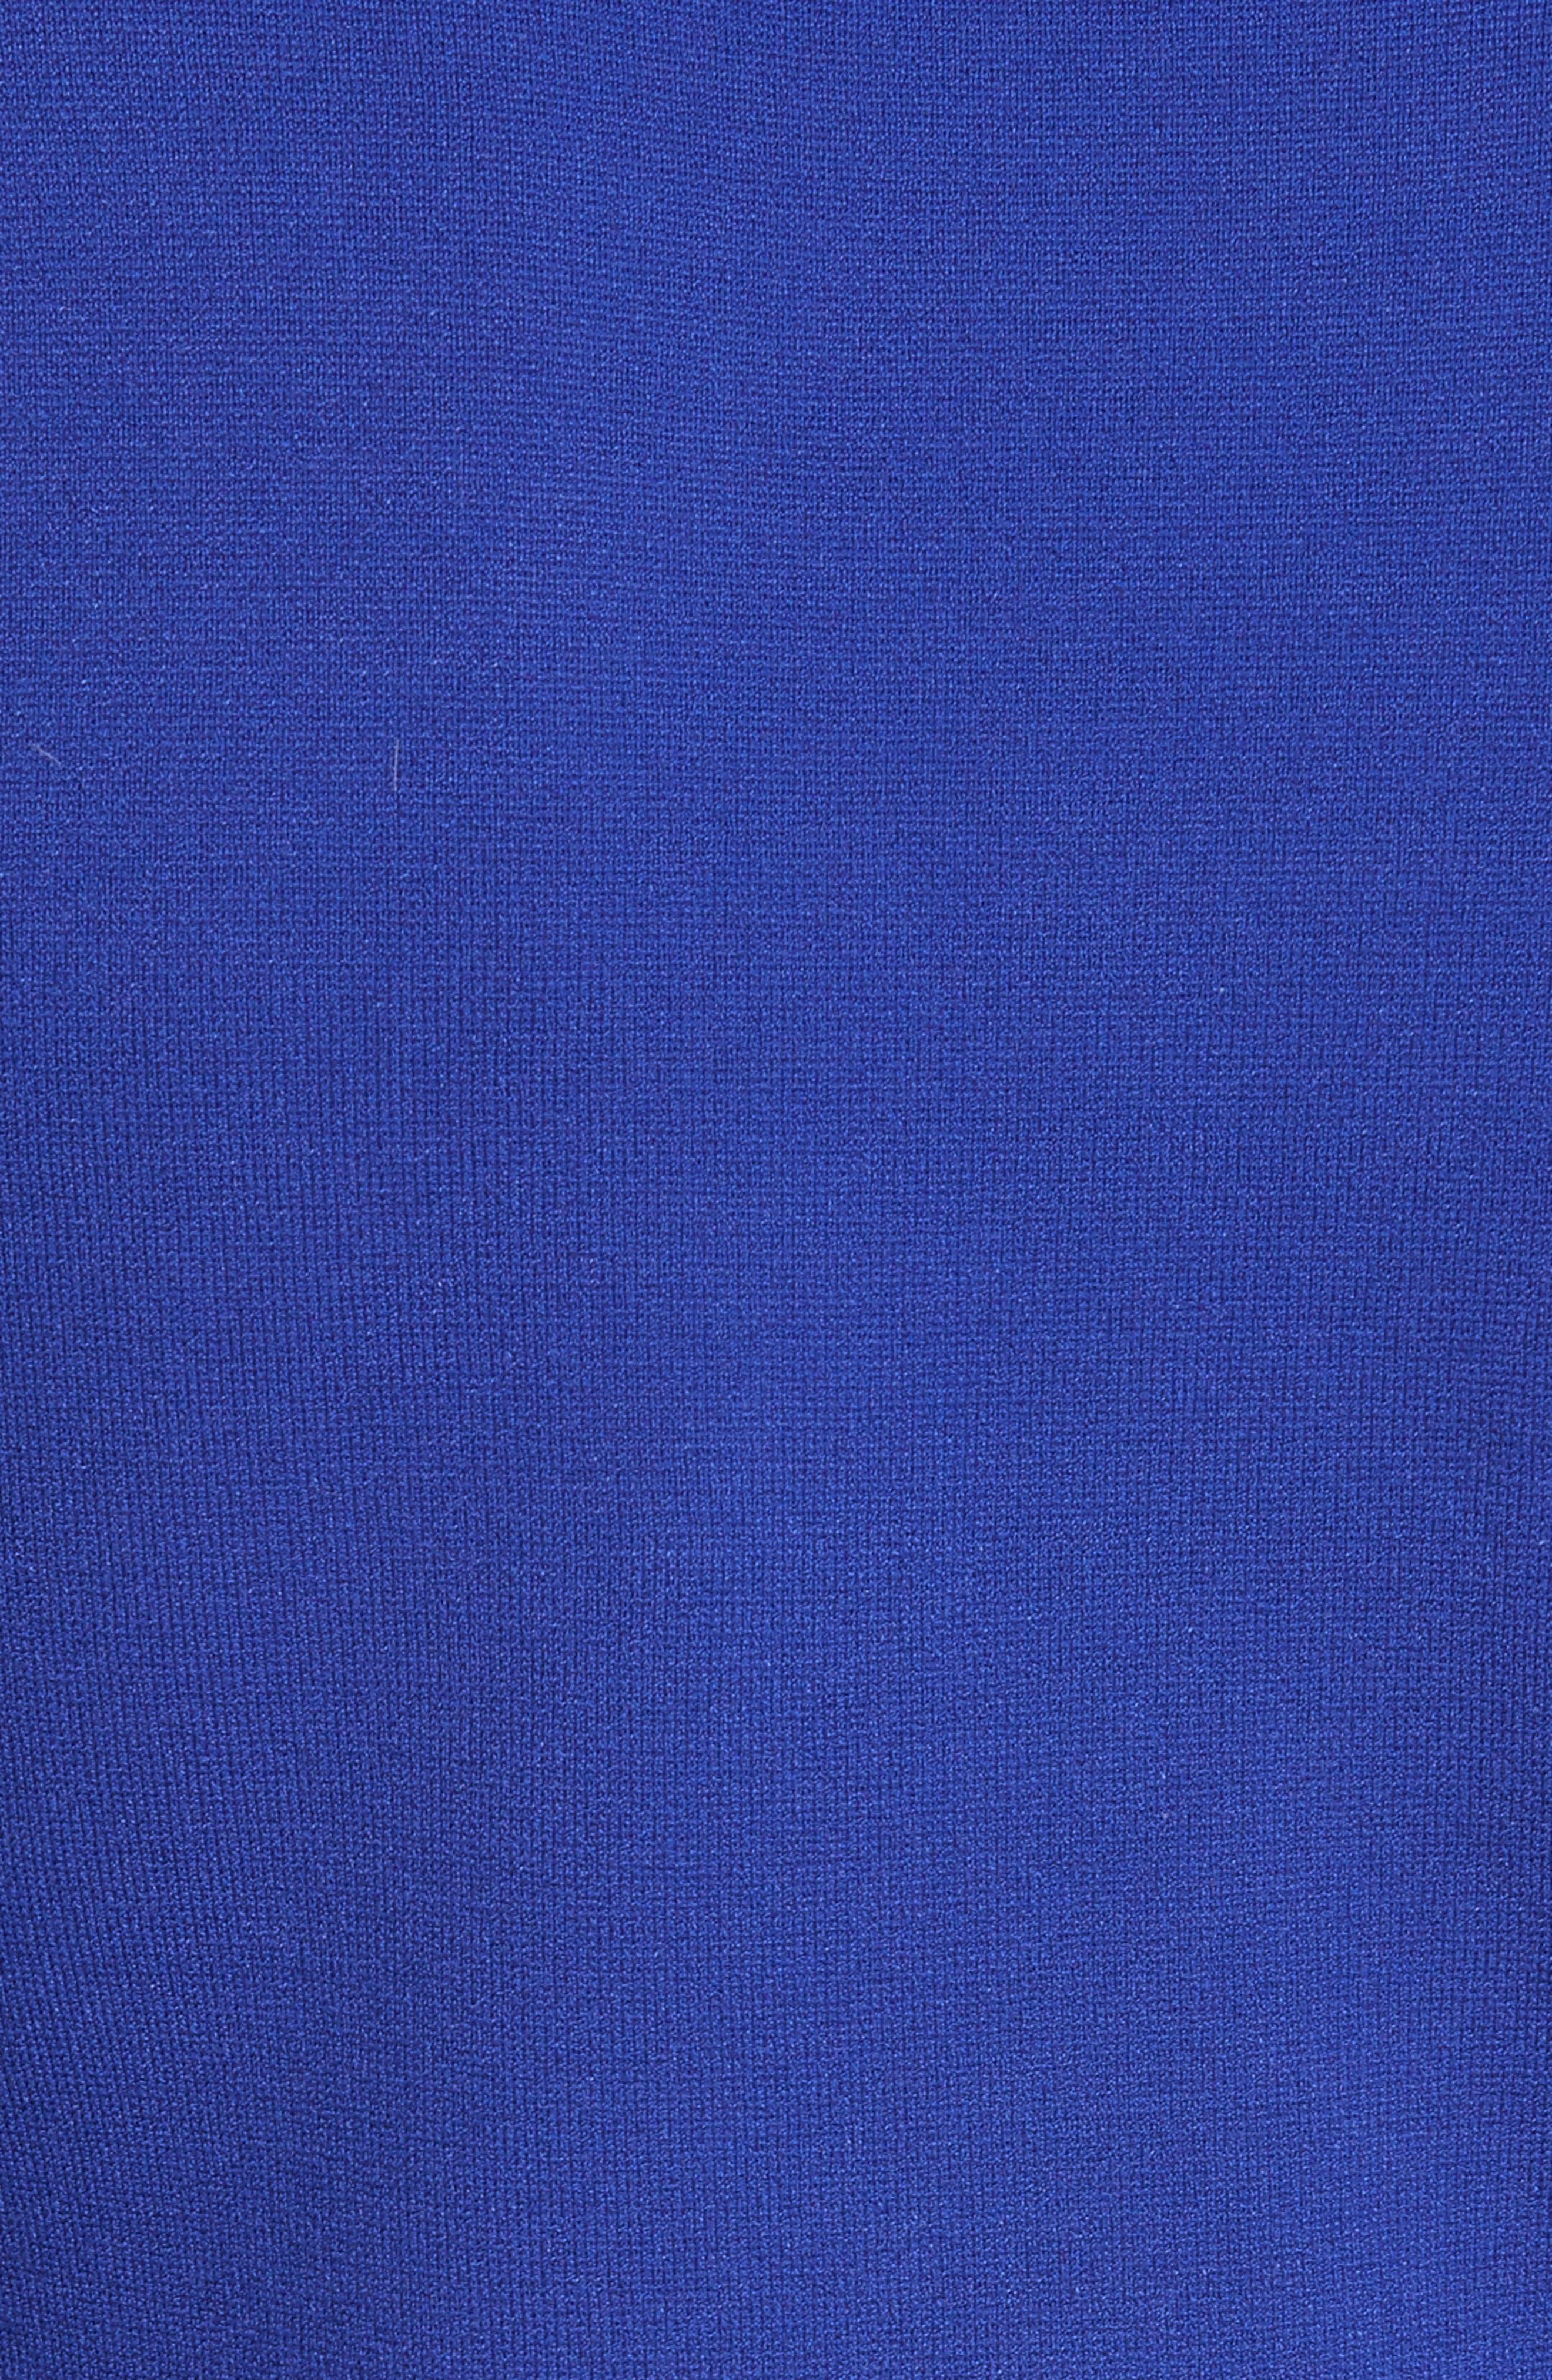 Diane von Furstenberg Flutter Sleeve Mock Neck Sweater,                             Alternate thumbnail 5, color,                             498